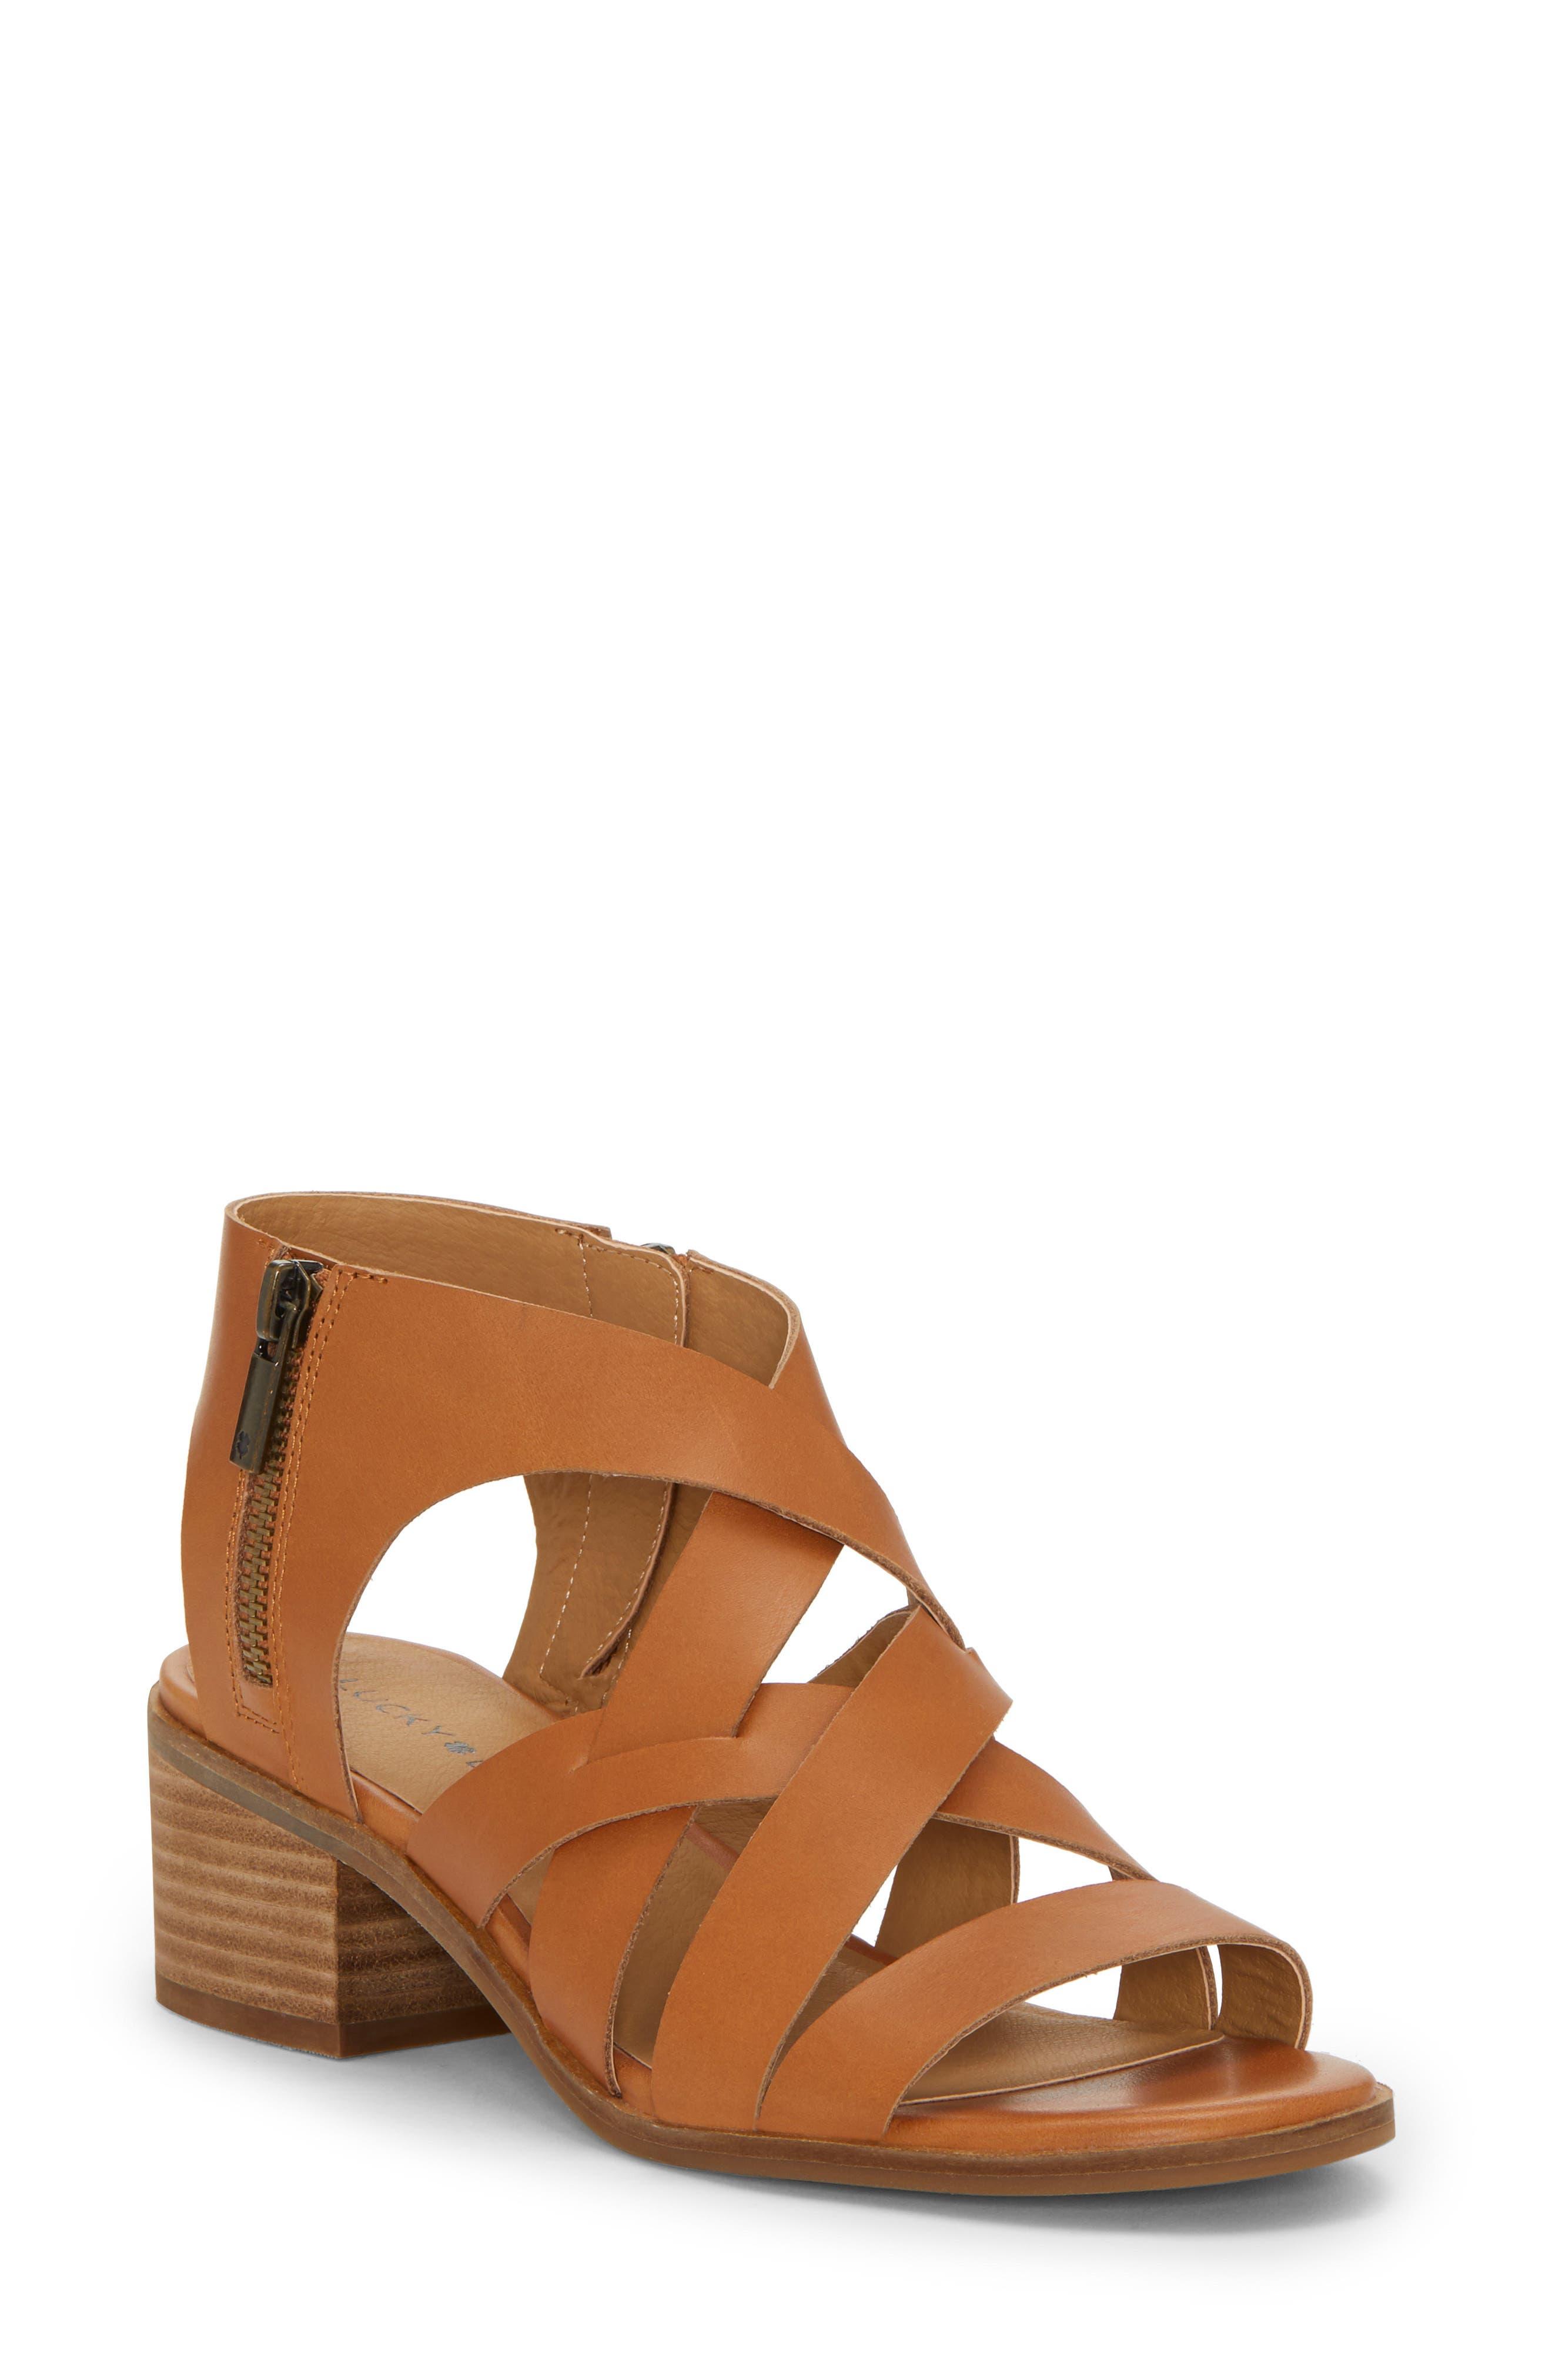 Lucky Brand Nayeli Sandal, Brown